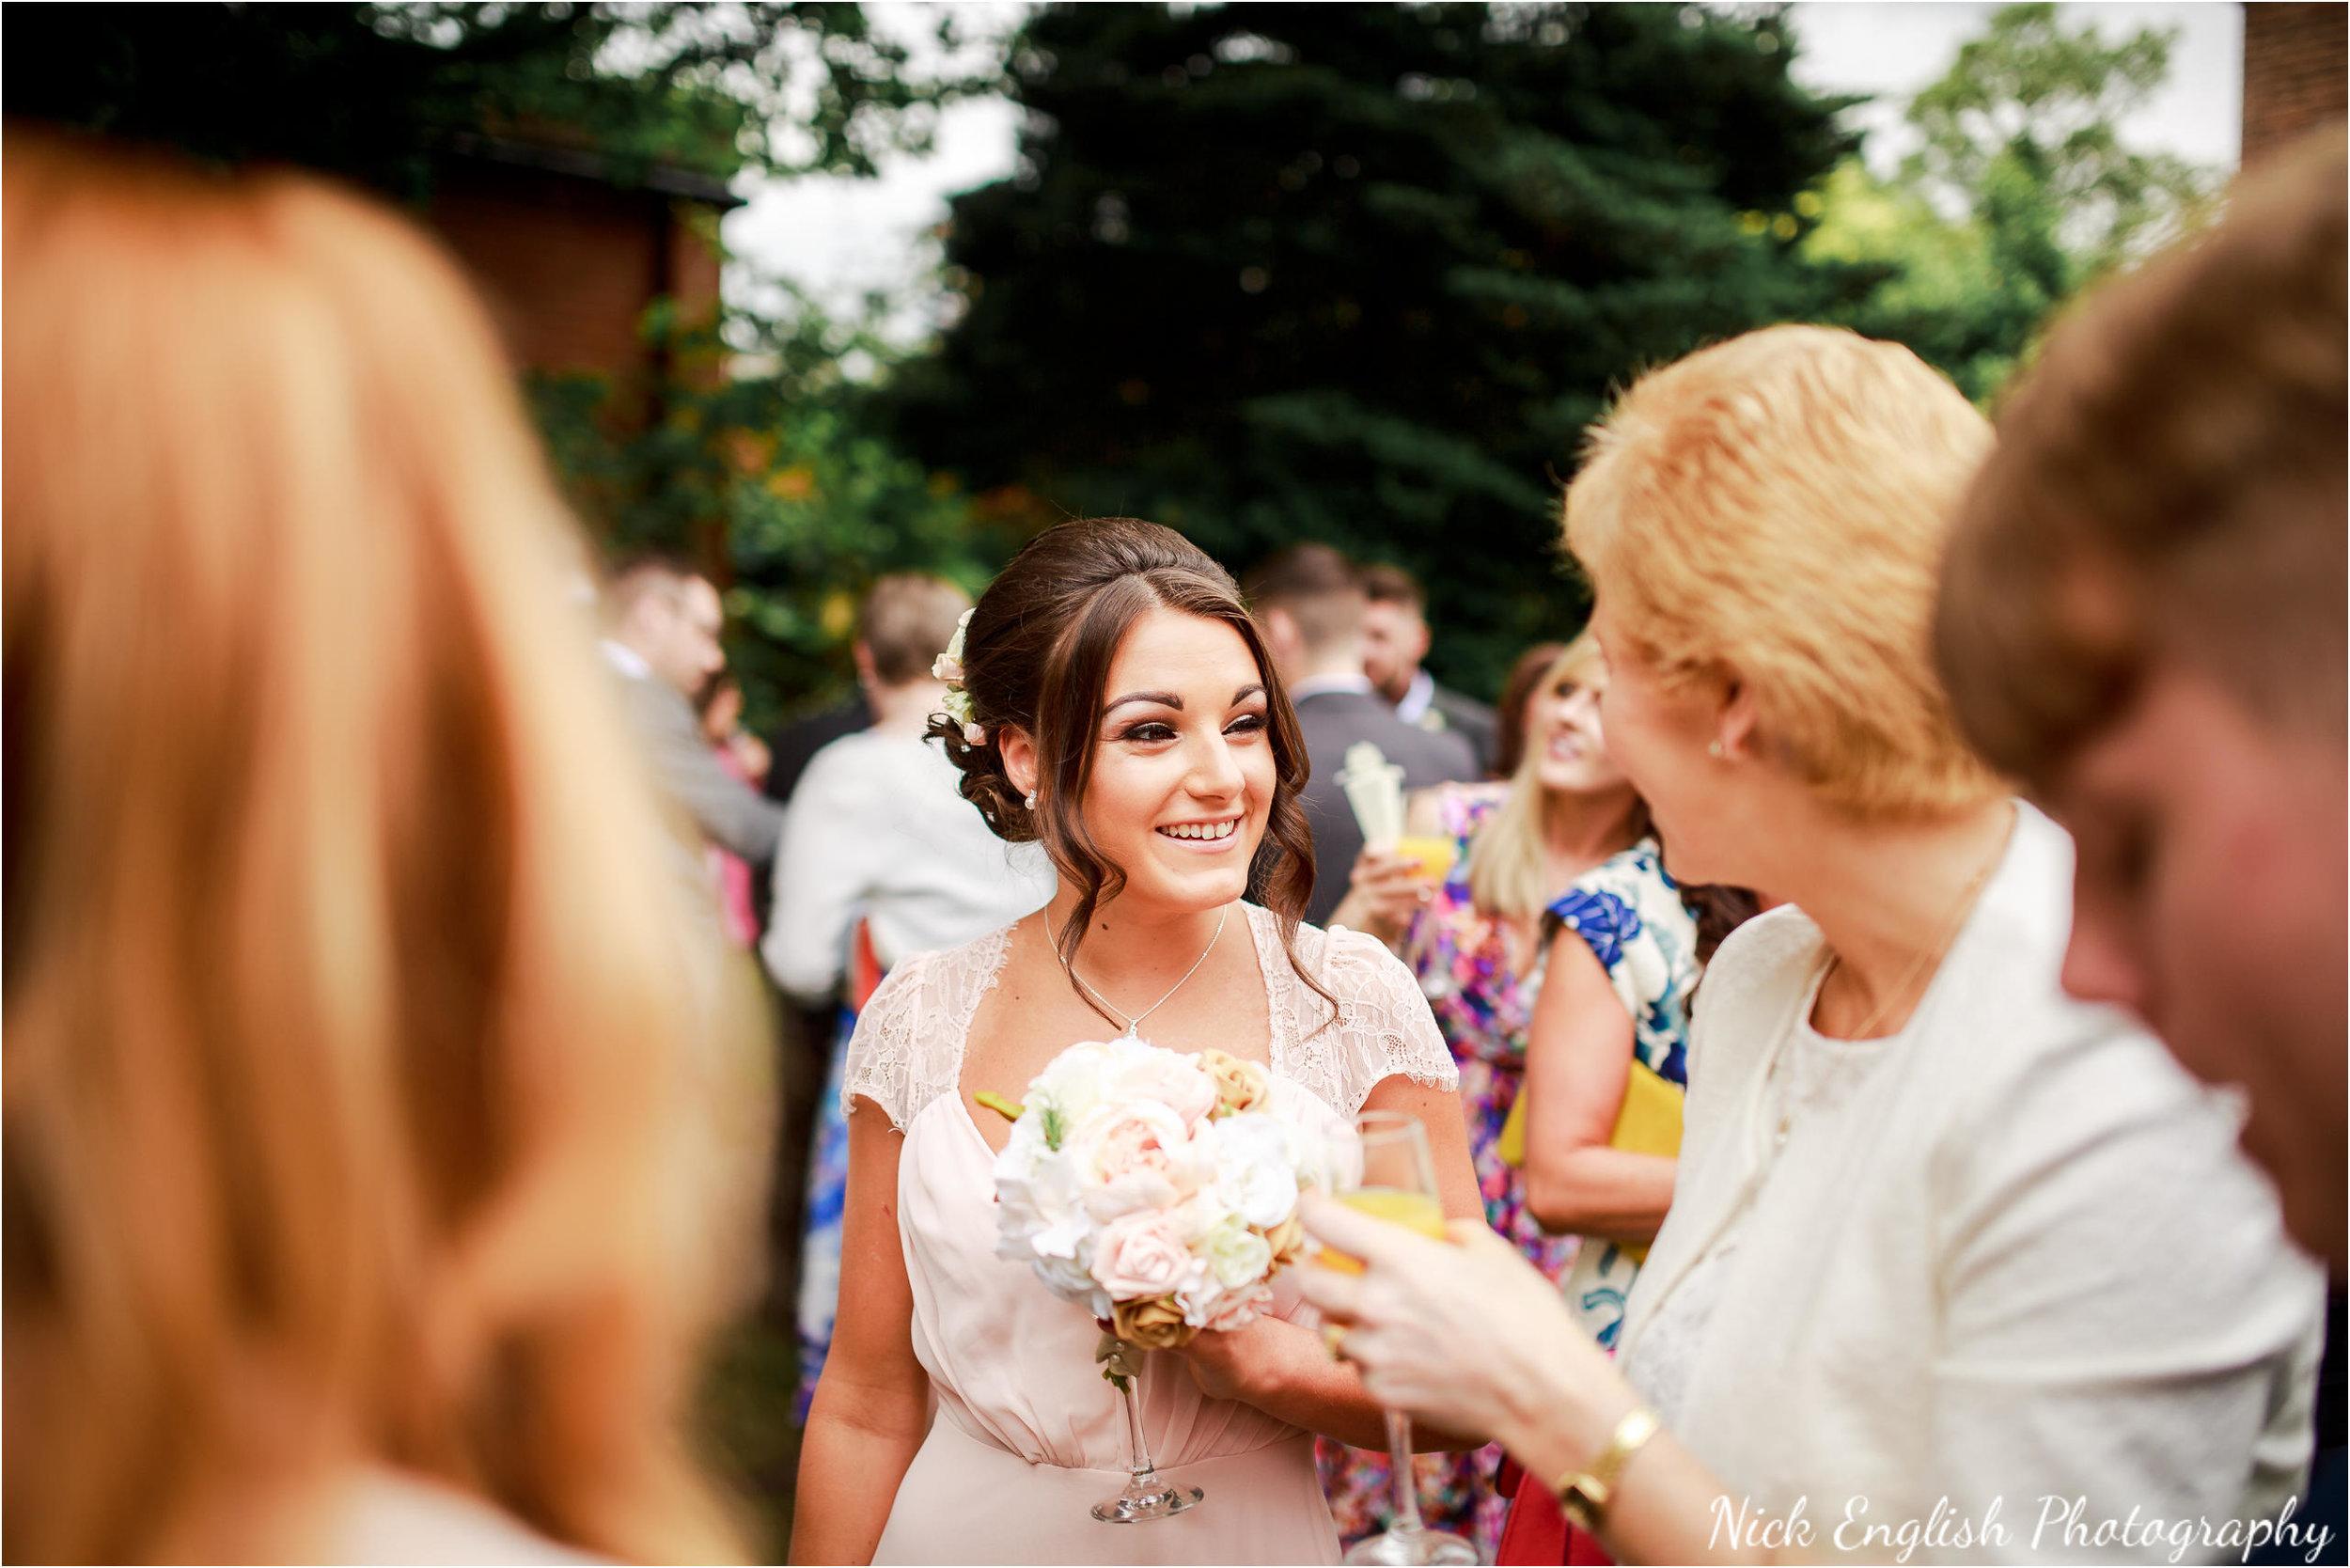 Emily David Wedding Photographs at Barton Grange Preston by Nick English Photography 118jpg.jpeg